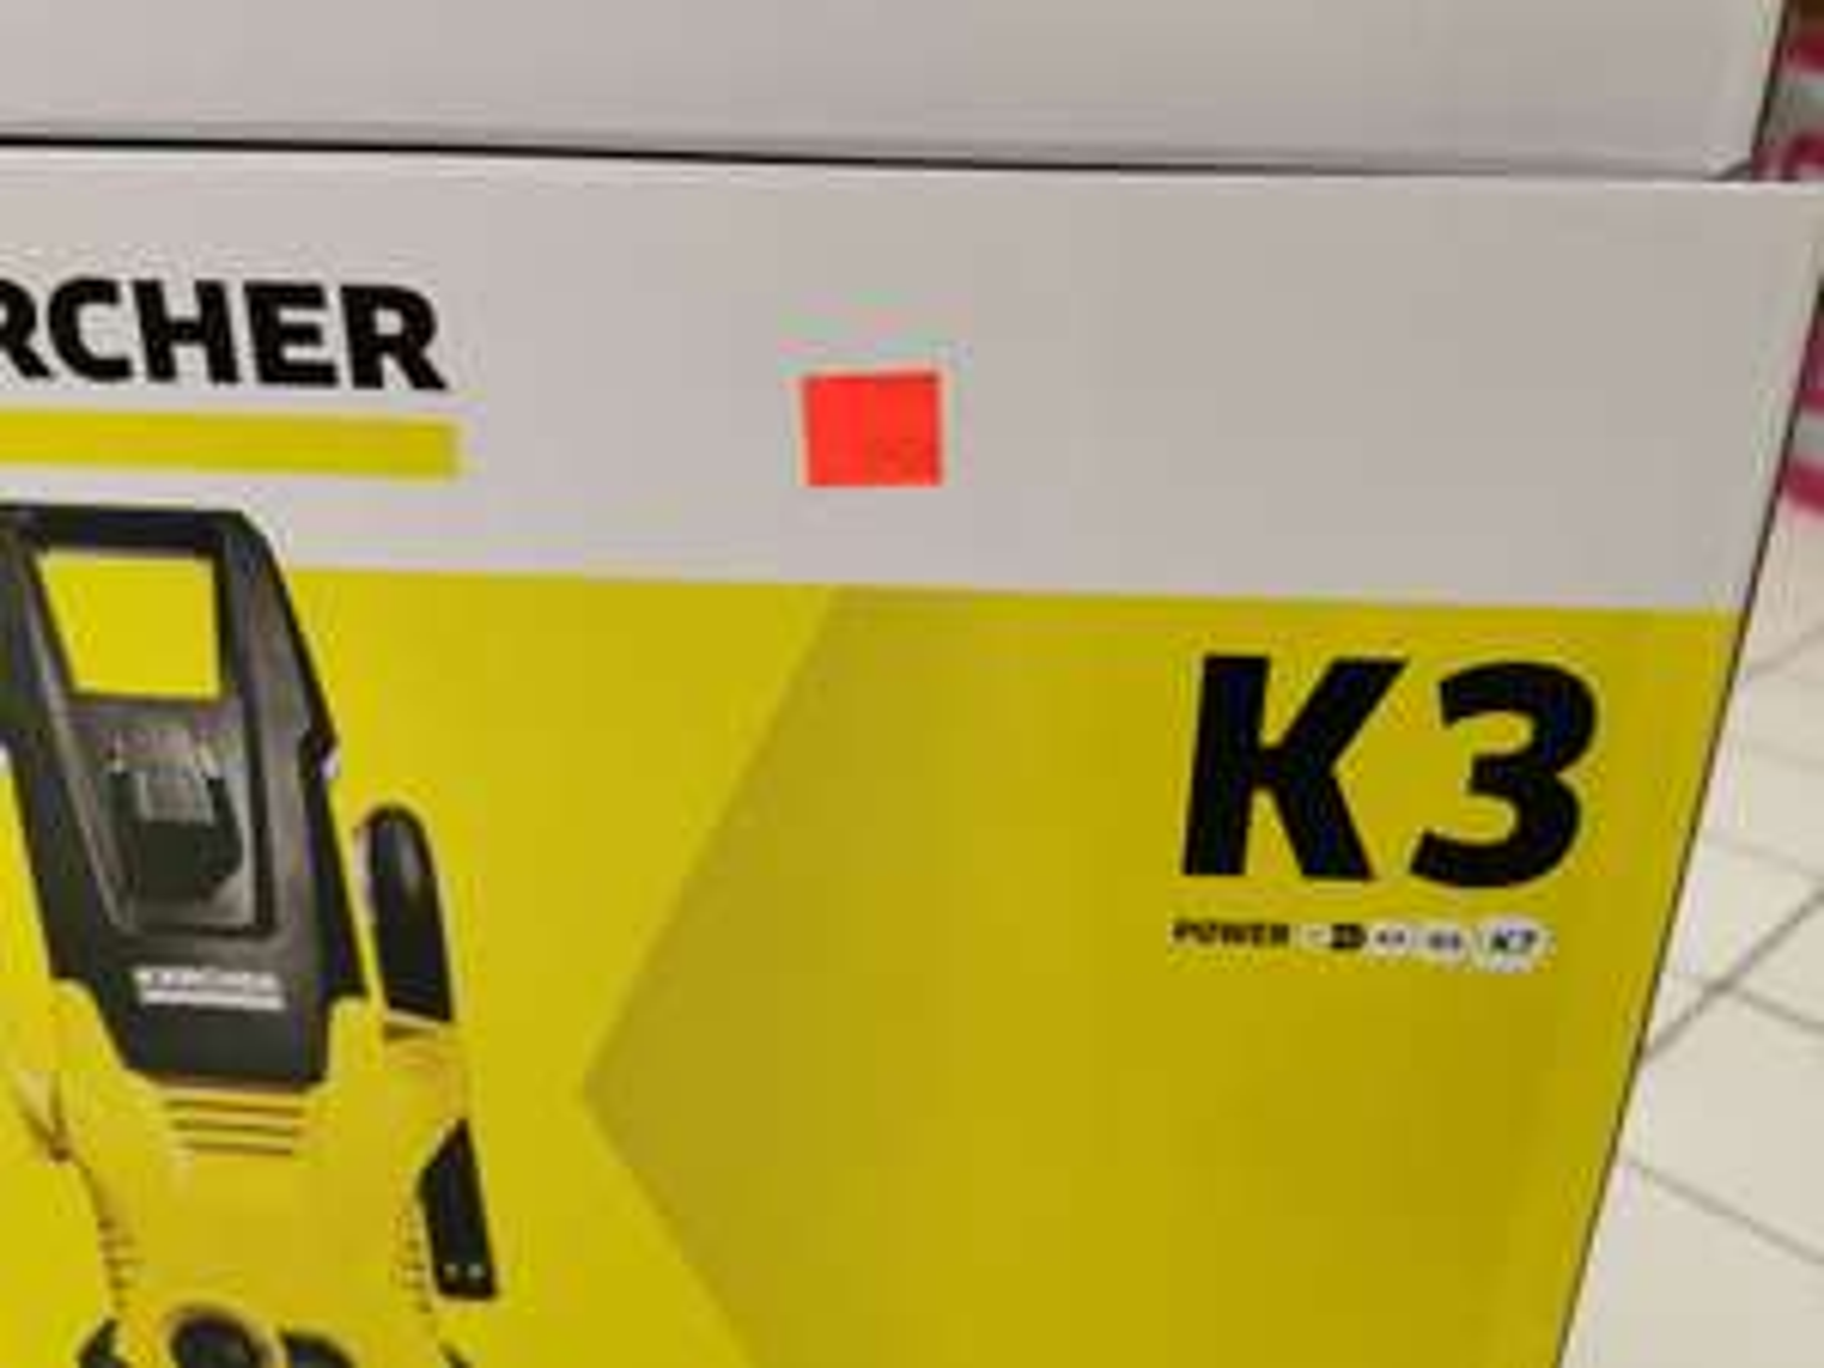 Nettoyeur haute pression Karcher K3 - Bercy (75)